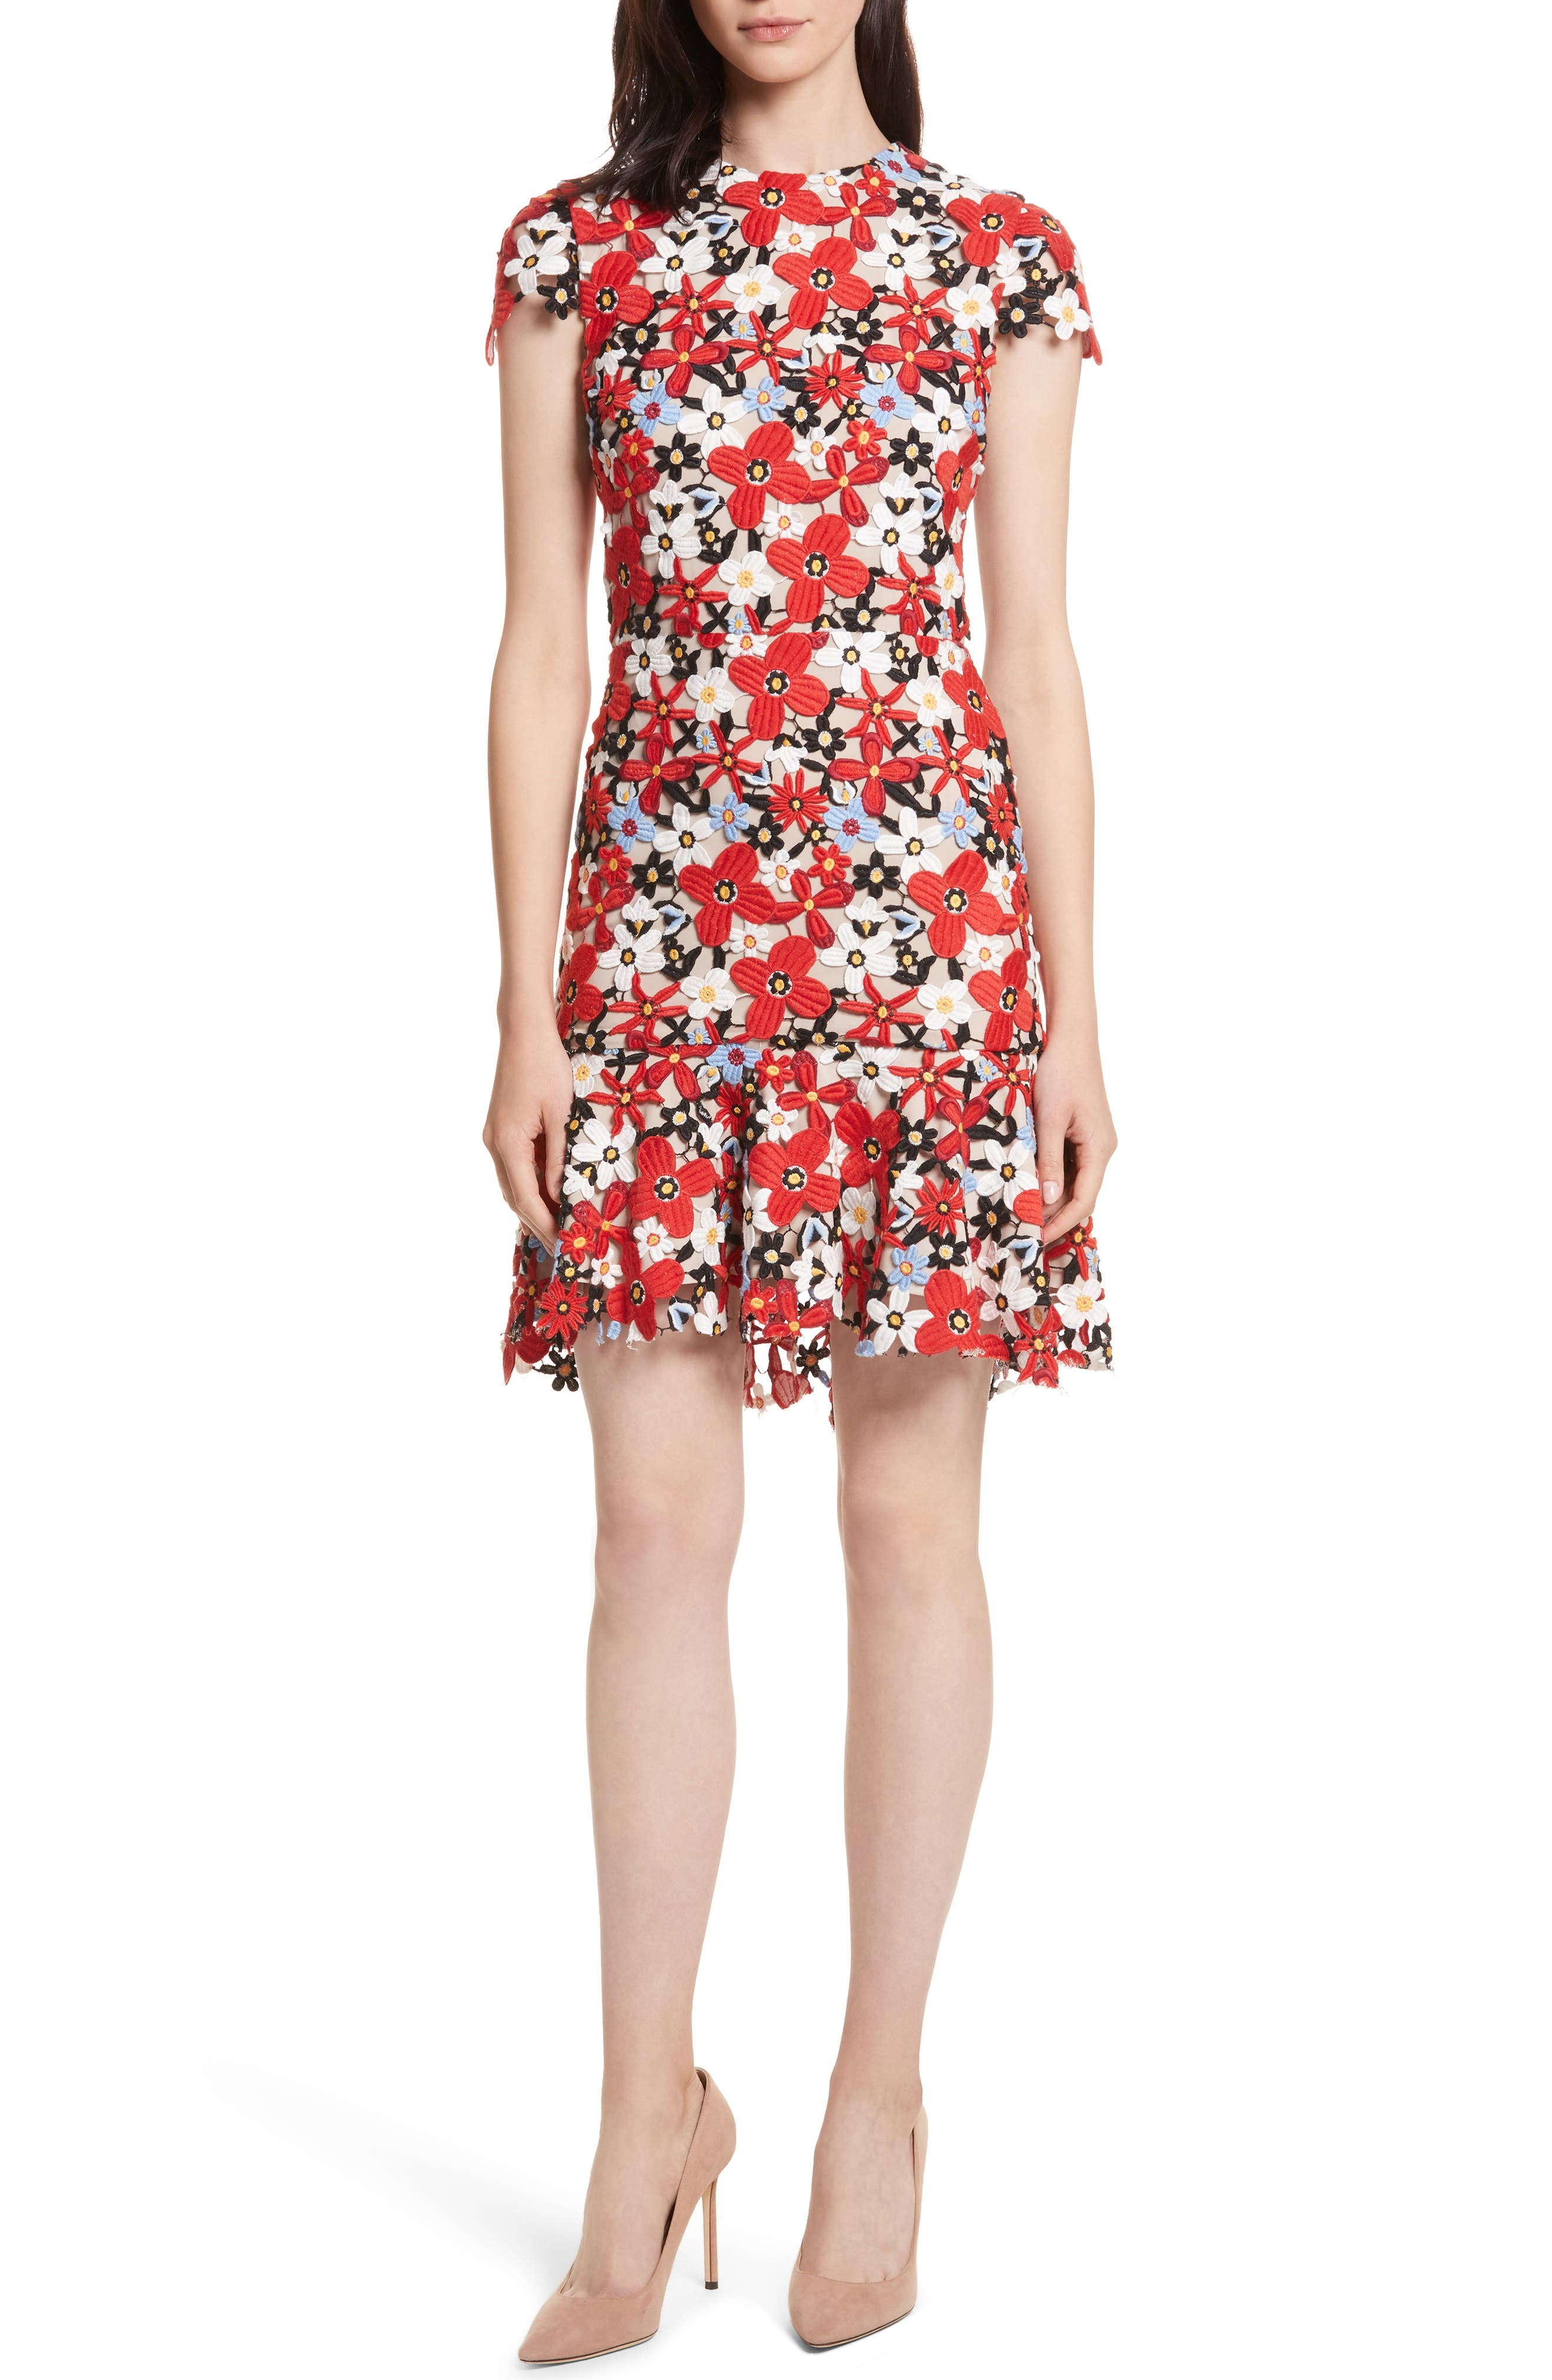 Main Image - Alice + Olivia Imani Floral Fit & Flare Dress